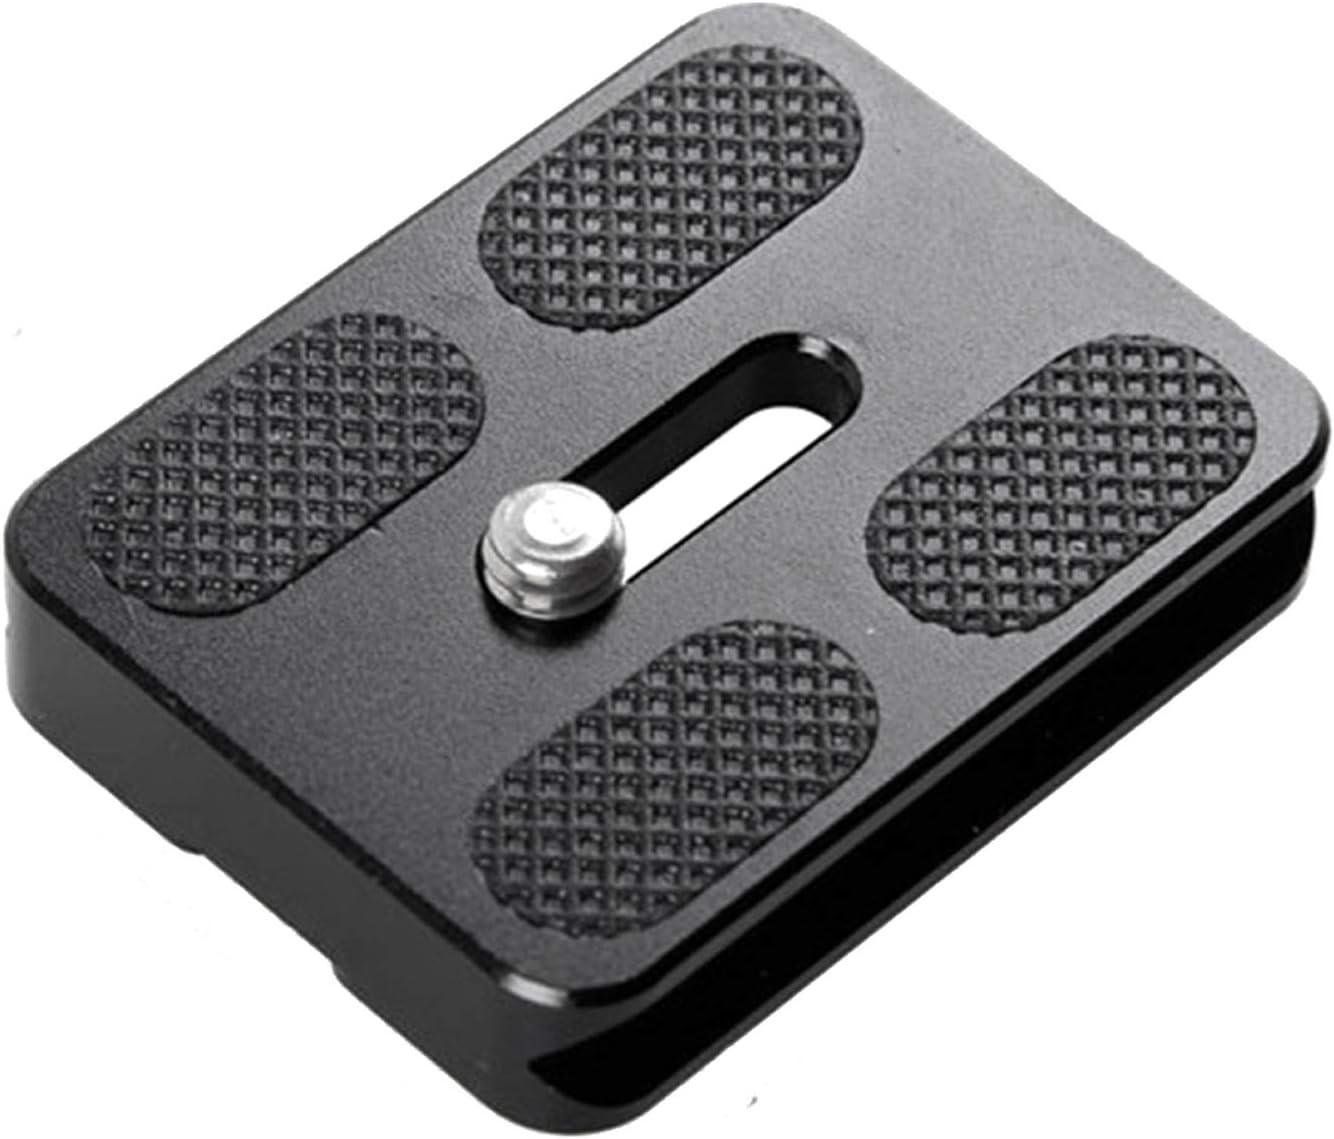 Amazon.com : Fotasy 50mm Arca Swiss Plate, 50 mm QR Plate, Quick ...